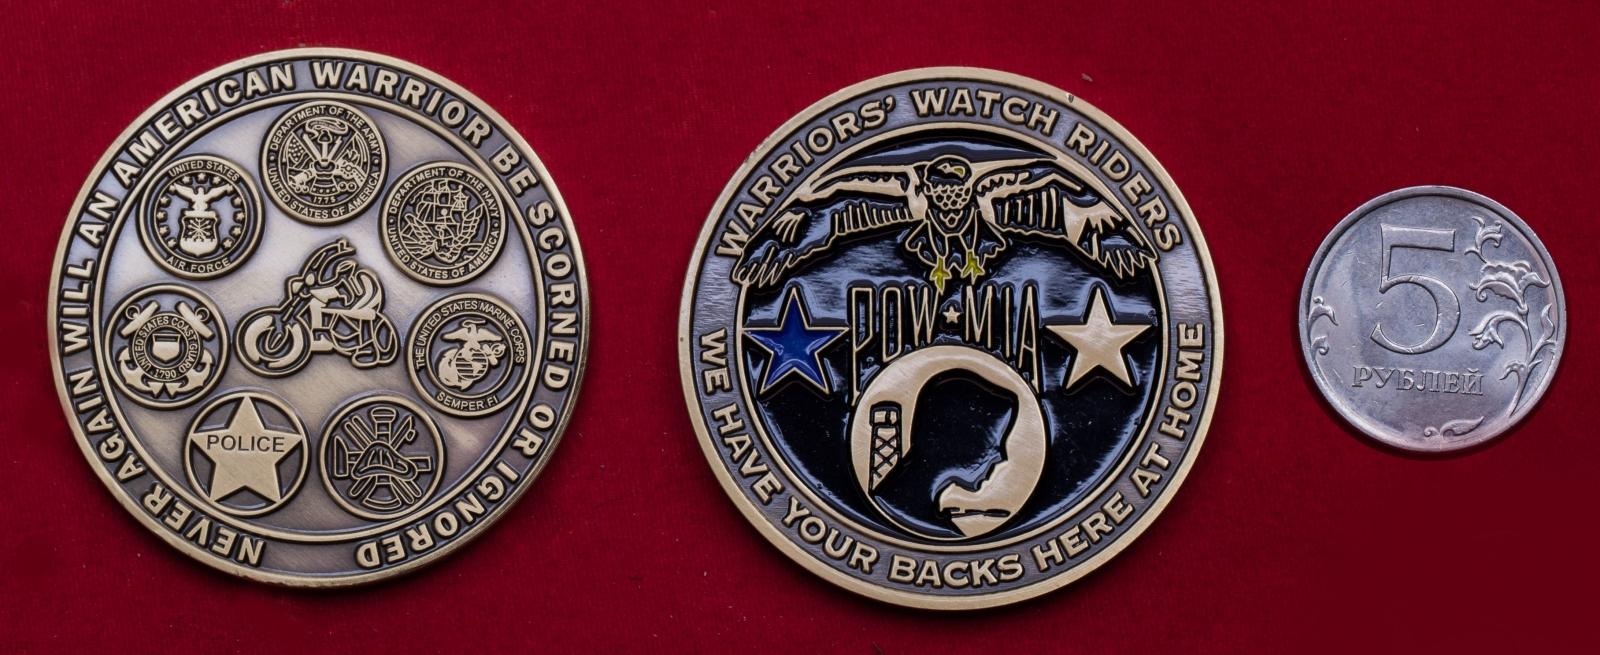 Челлендж коин байкерского клуба ветеранов армии США Warrior